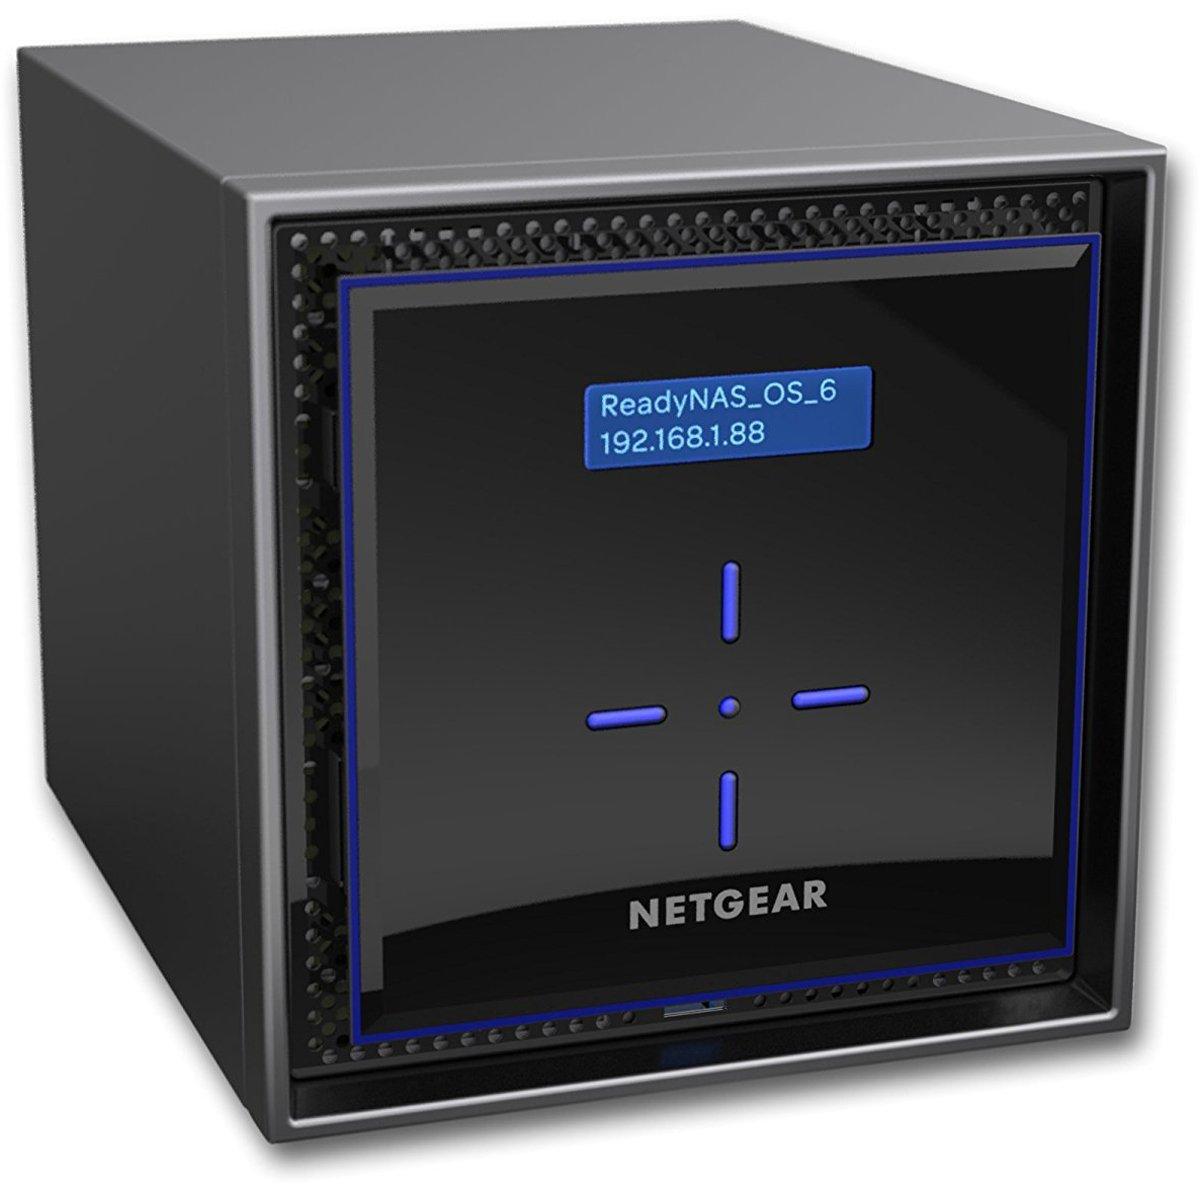 NETGEAR ReadyNAS Diskless Performance Processor